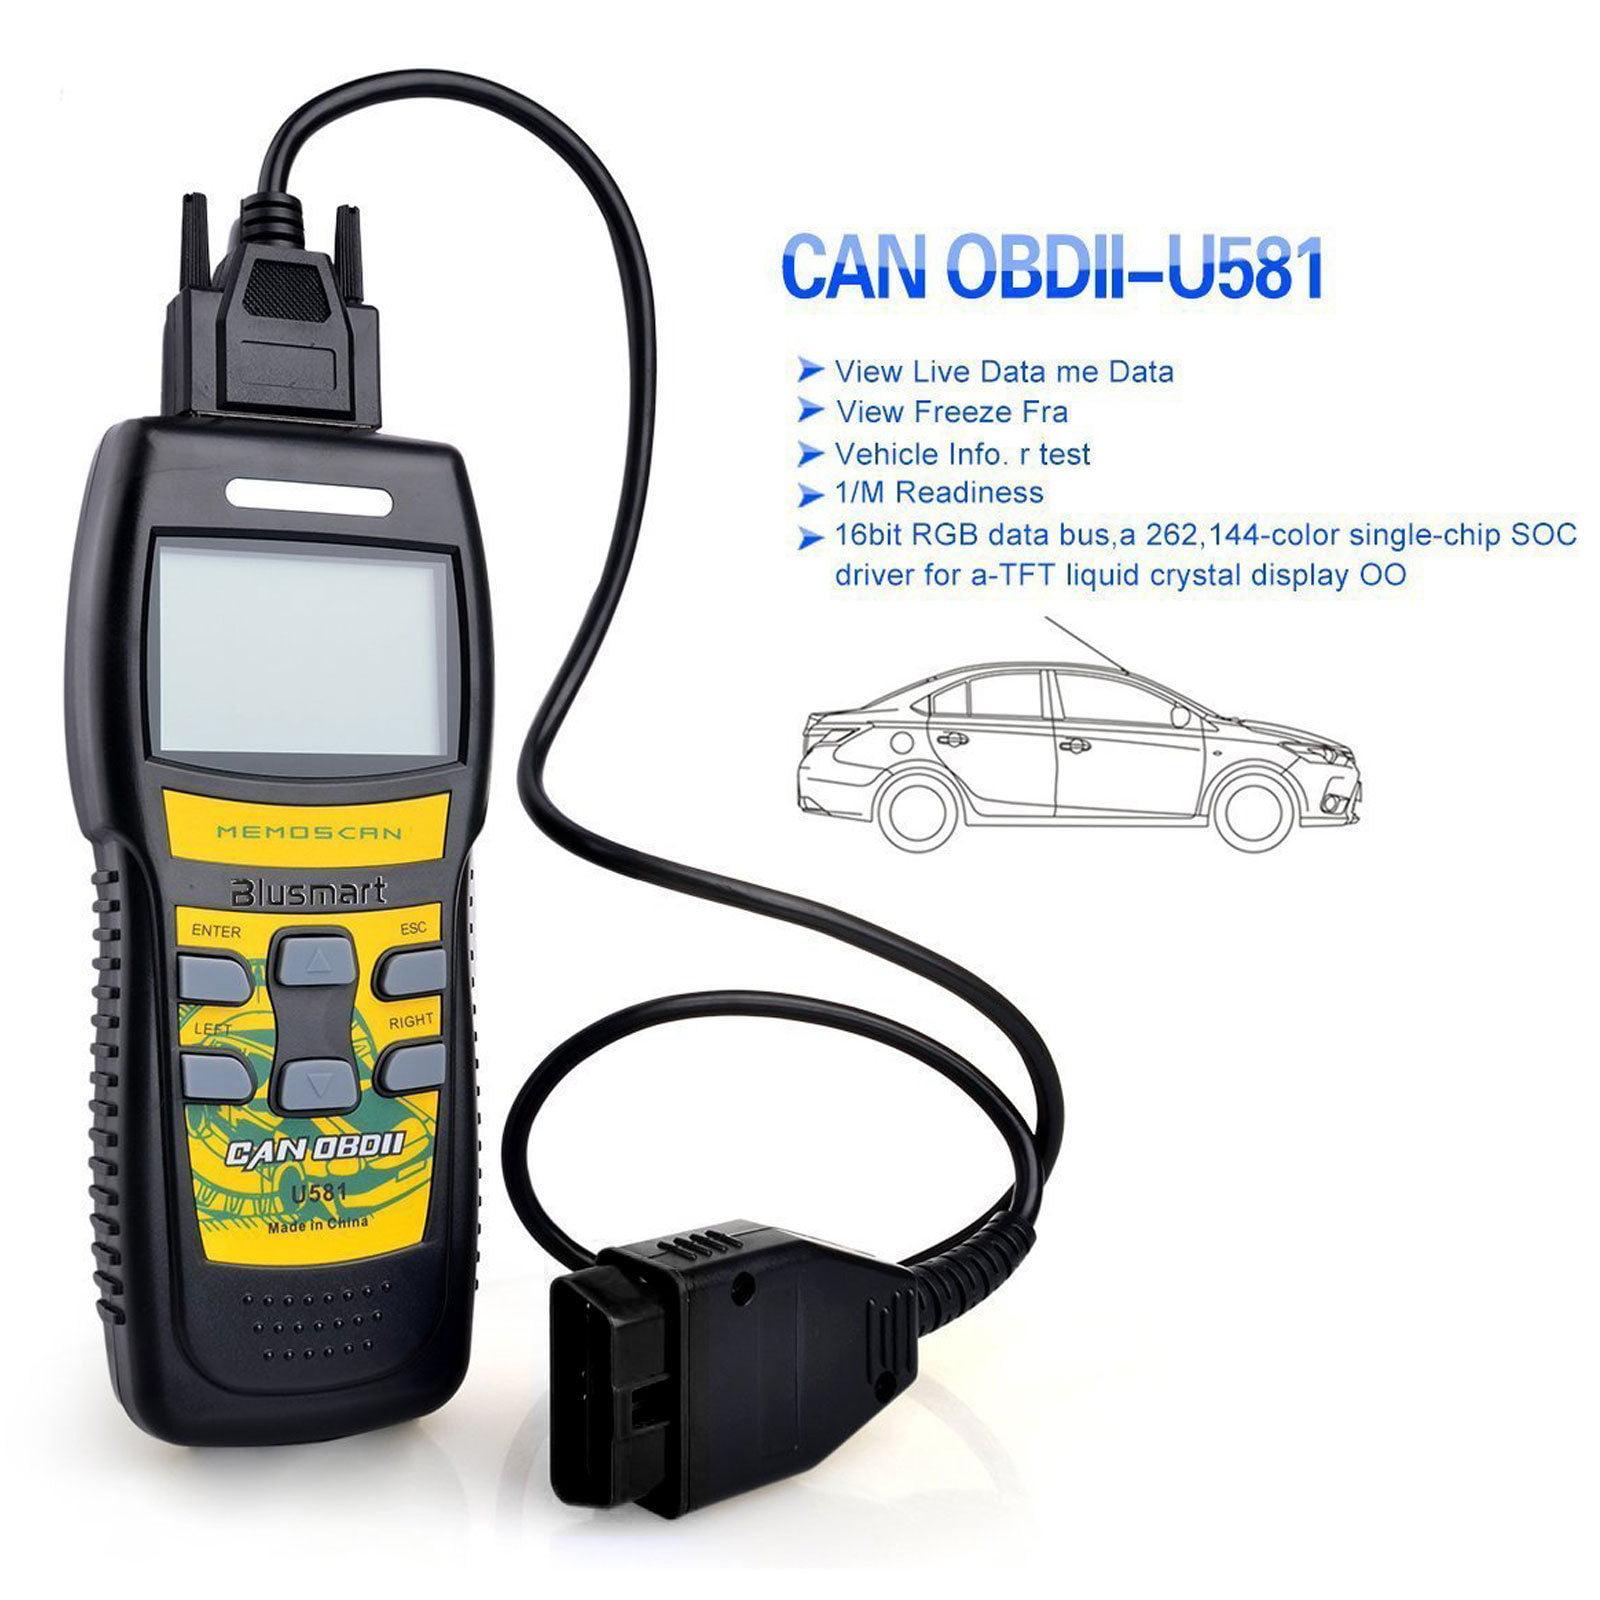 EEEKit U581 Professional Diagnostic Tool CAN OBD II OBD2 Code Scanner Reader